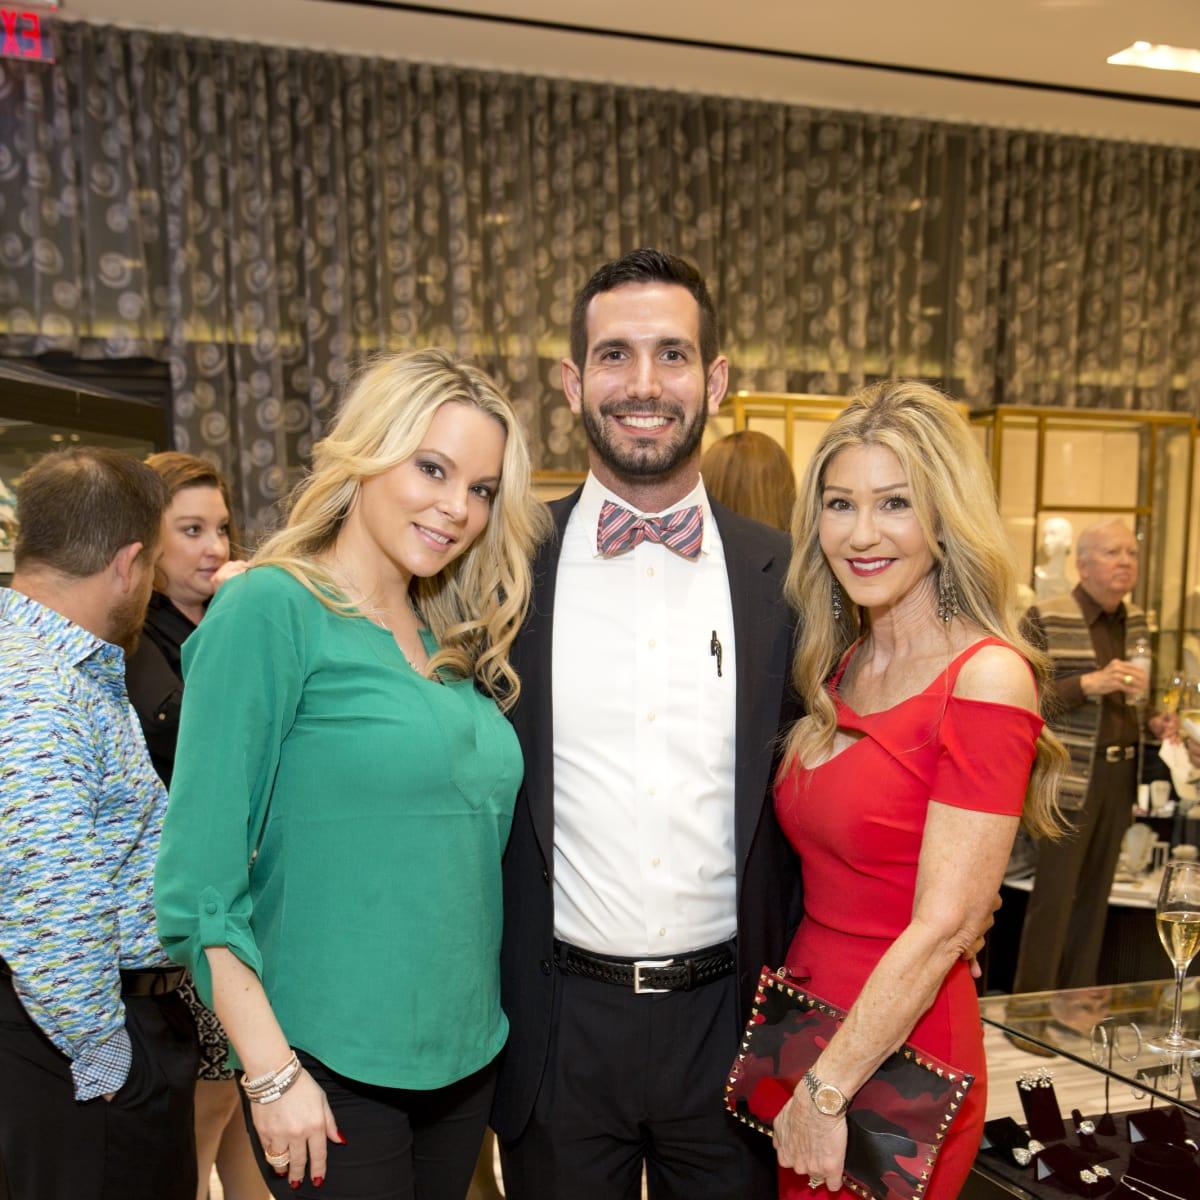 News, Tenenbaum at Tootsies, Dec. 2015, Name, Patrick Darby, Patti Murphy